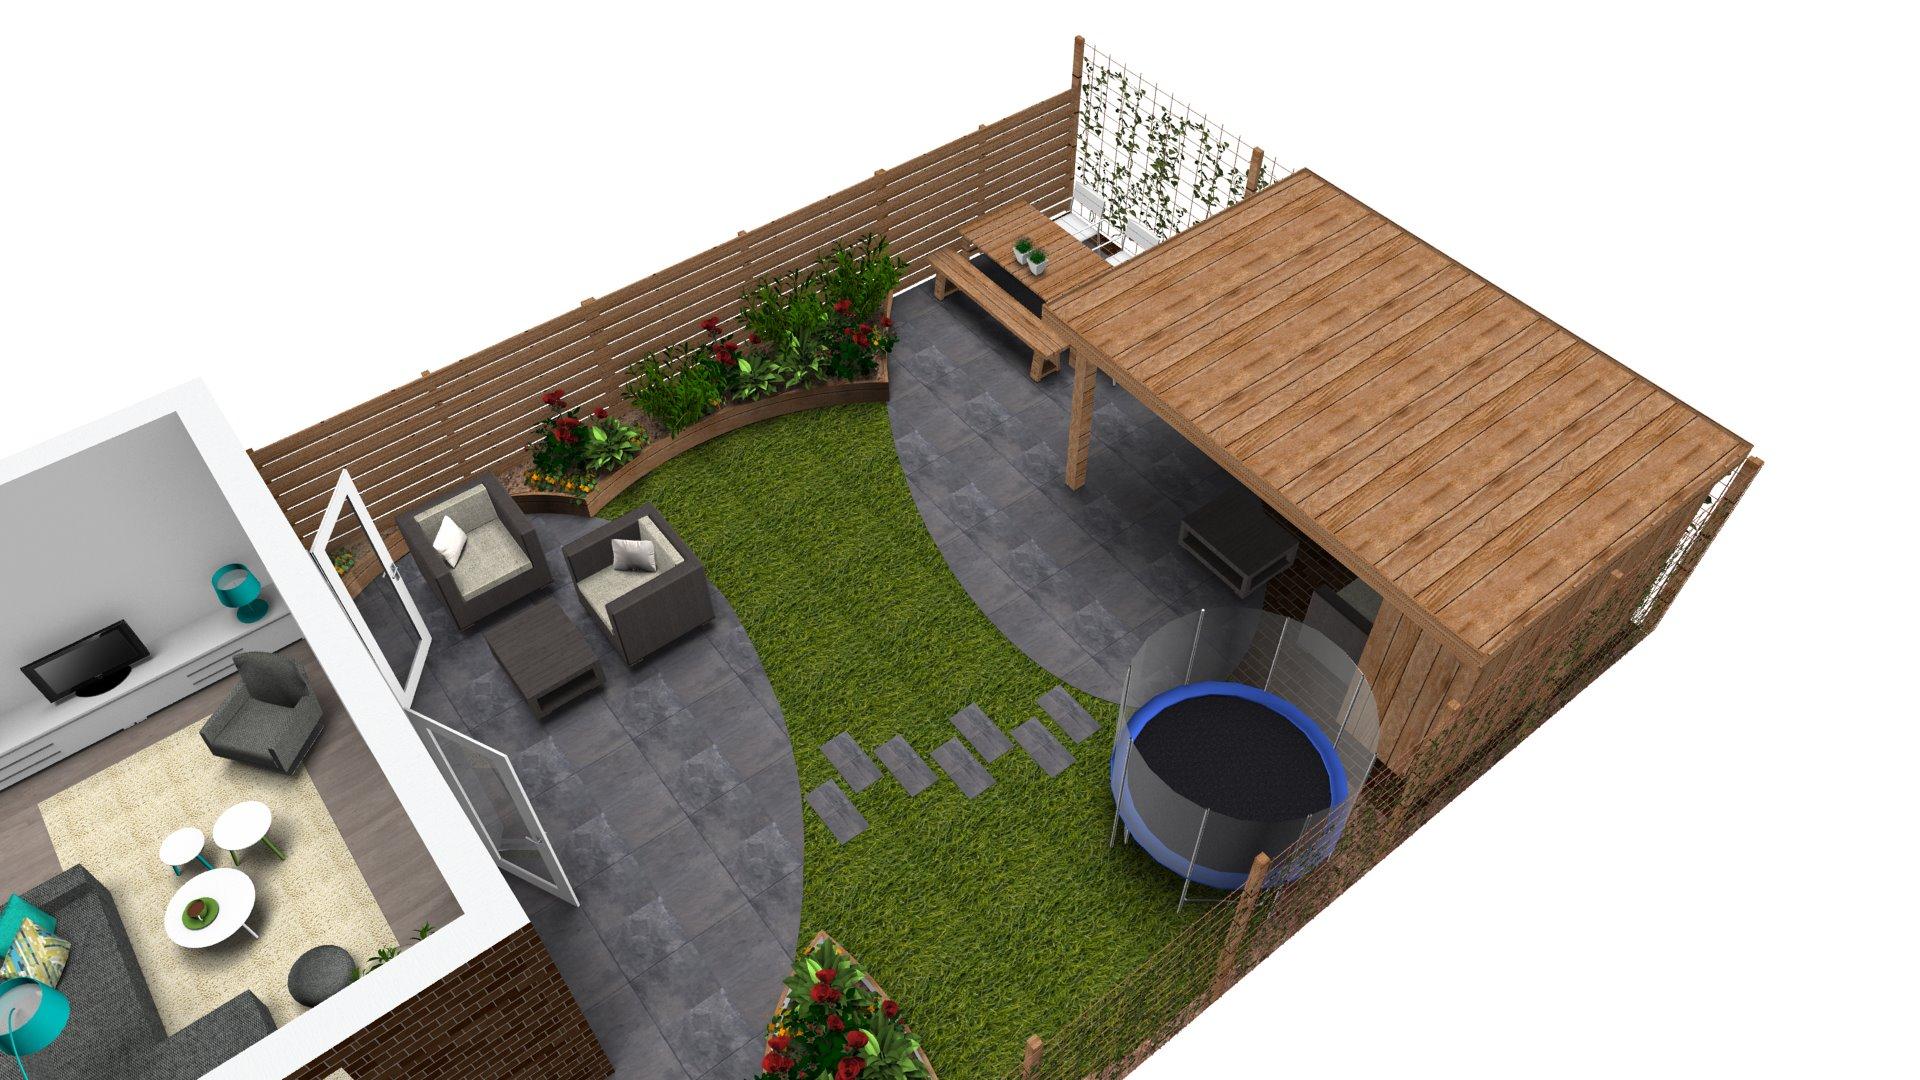 Terrasoverkapping Kleine Tuin : Bekend overkapping in kleine tuin lf08 belbin.info